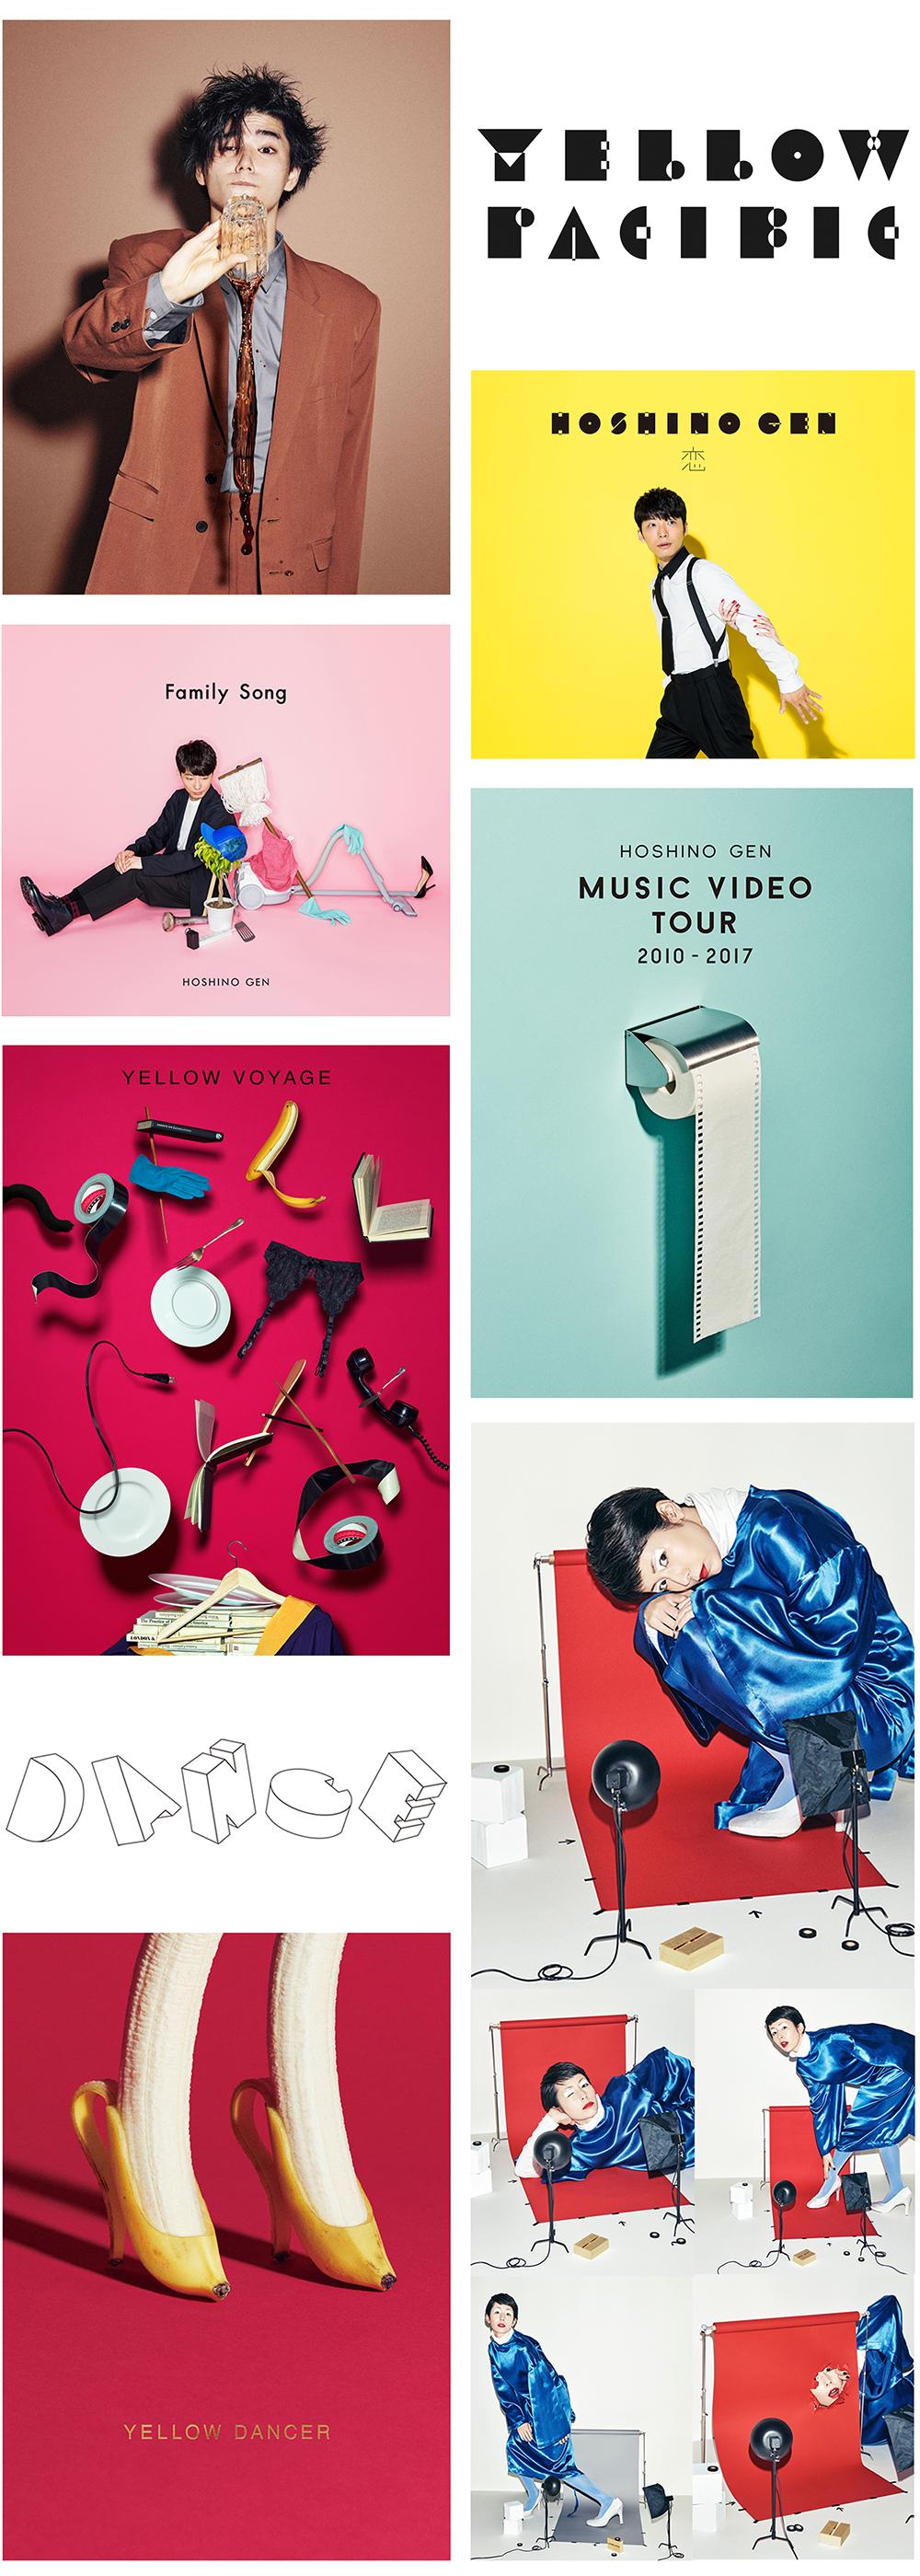 Yuni Yoshida是日本的平面设计师和艺术总监,他以多彩的超现实主义形象而闻名。 Yuni毕业于Joshibi艺术与设计大学后,曾在几家广告公司工作过。 2007年,......